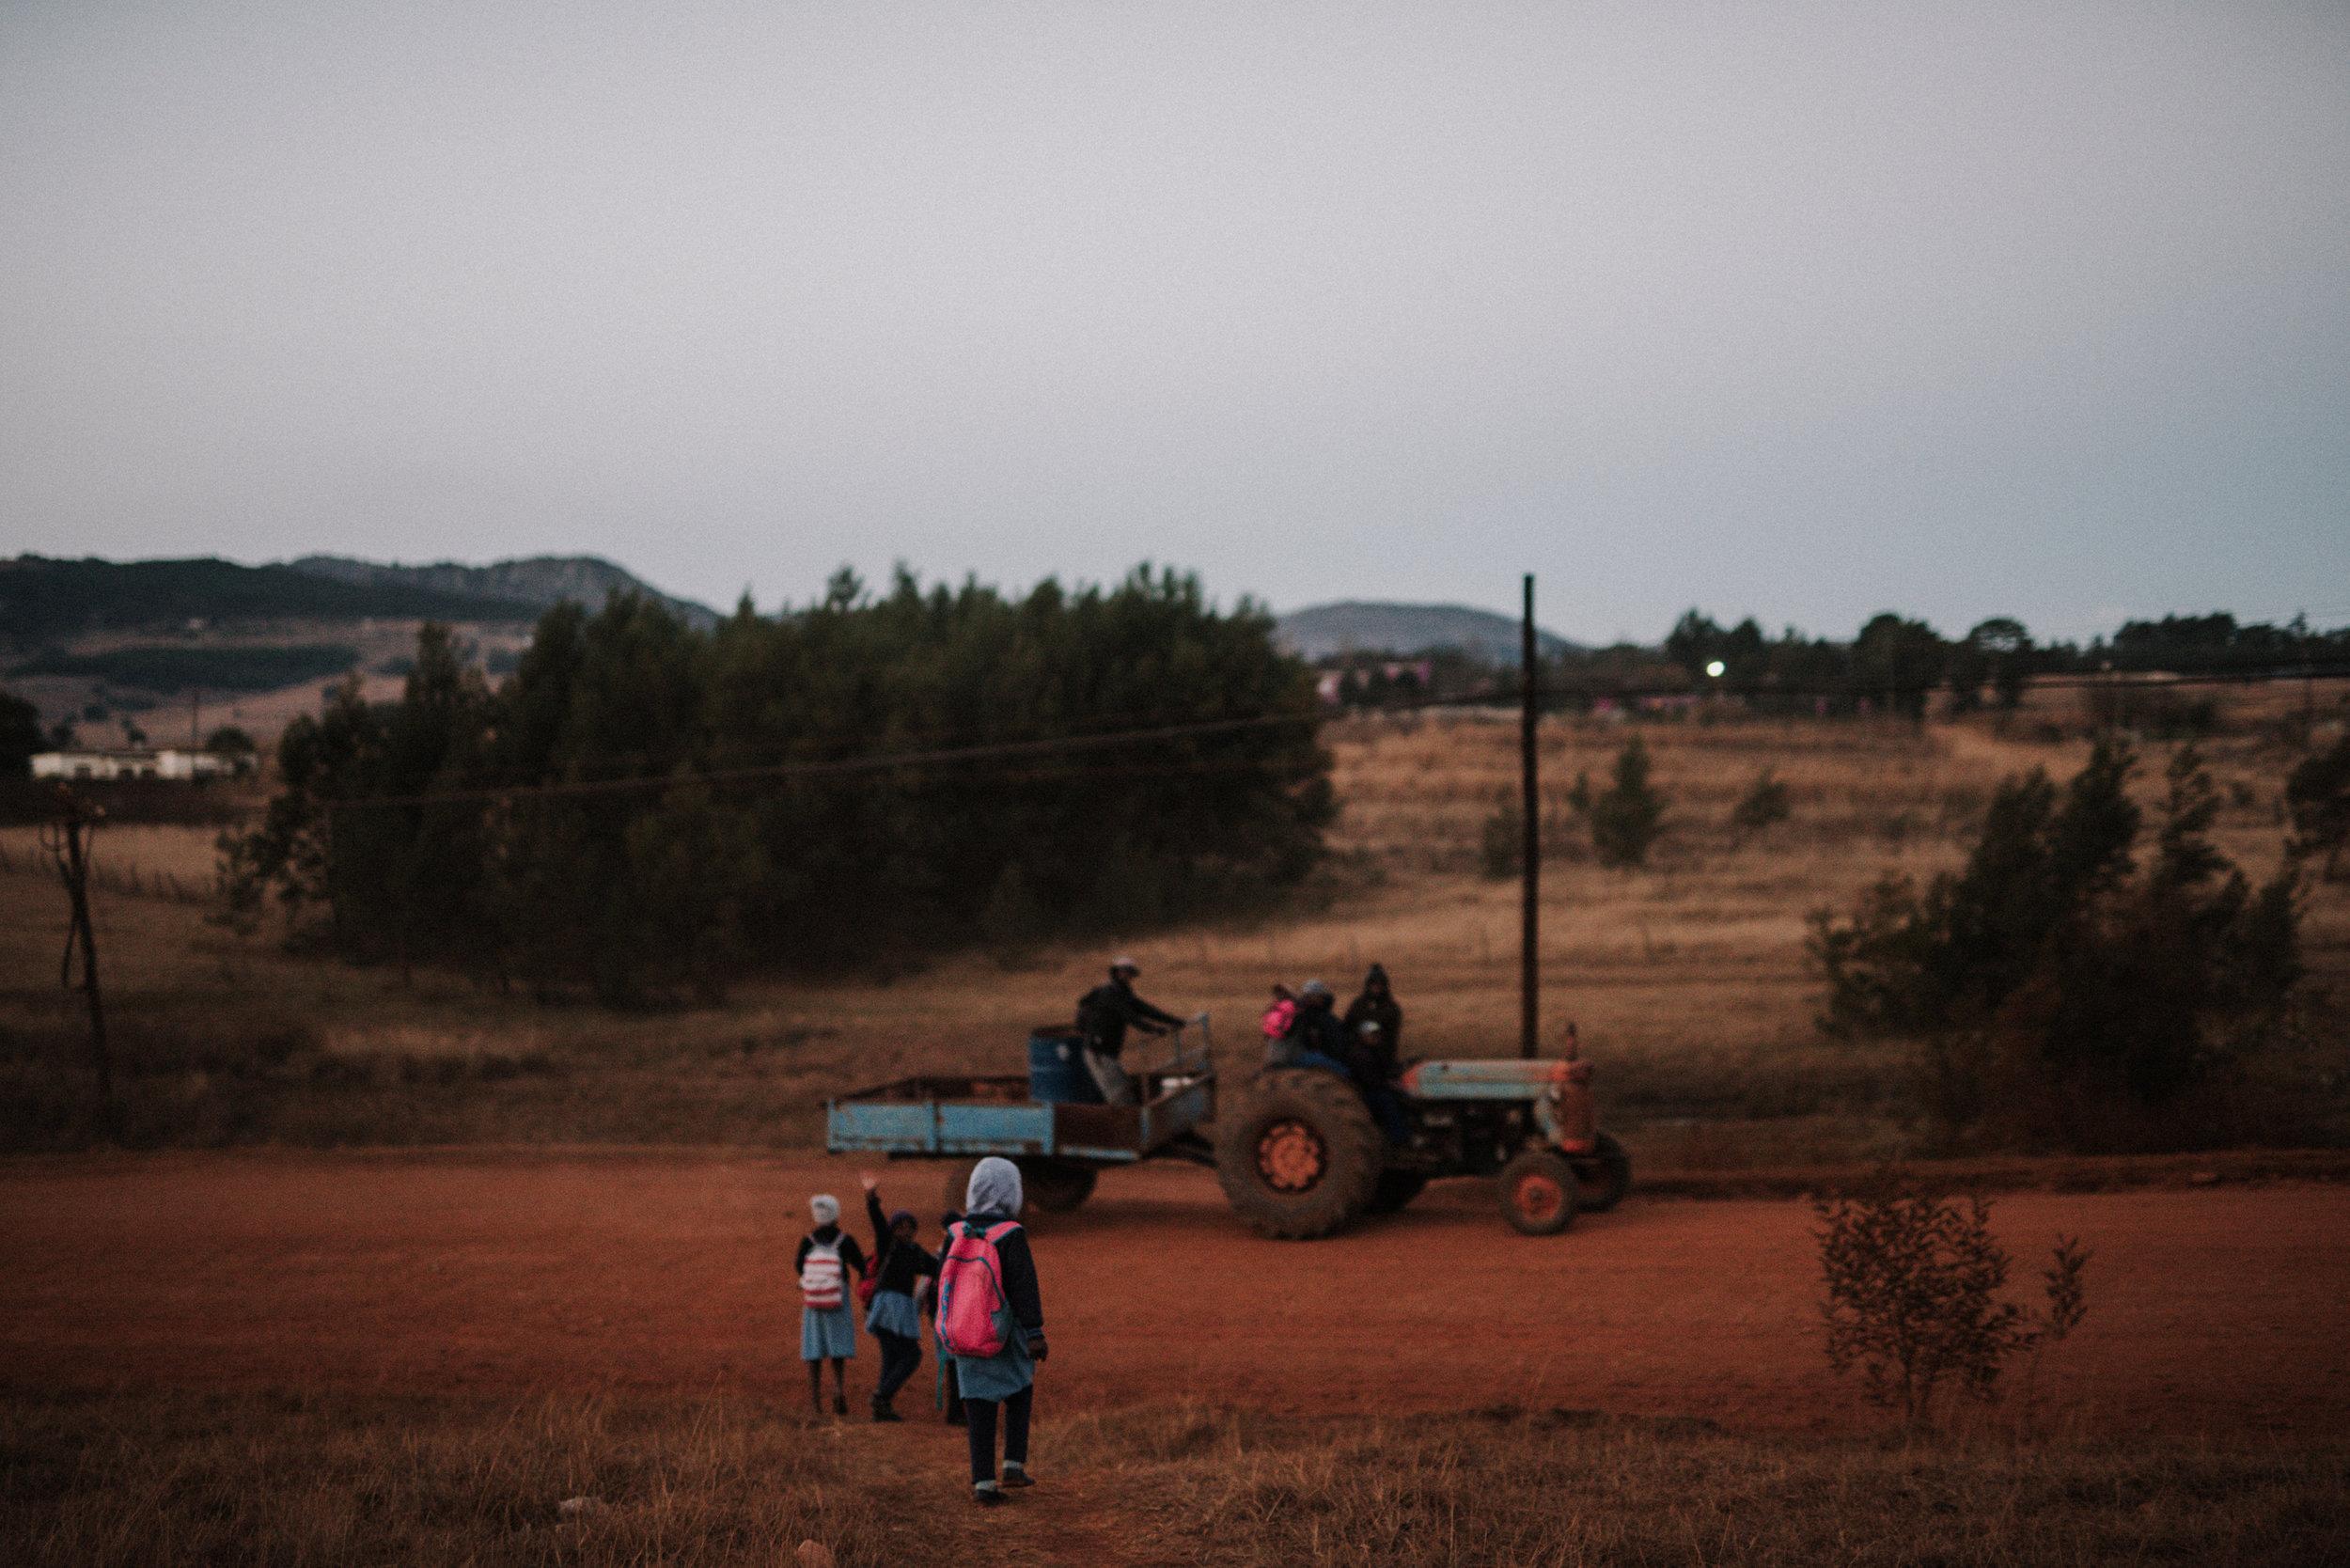 TaraShupe_Photography_Swaziland_HumanitarianPhotography_025.jpg